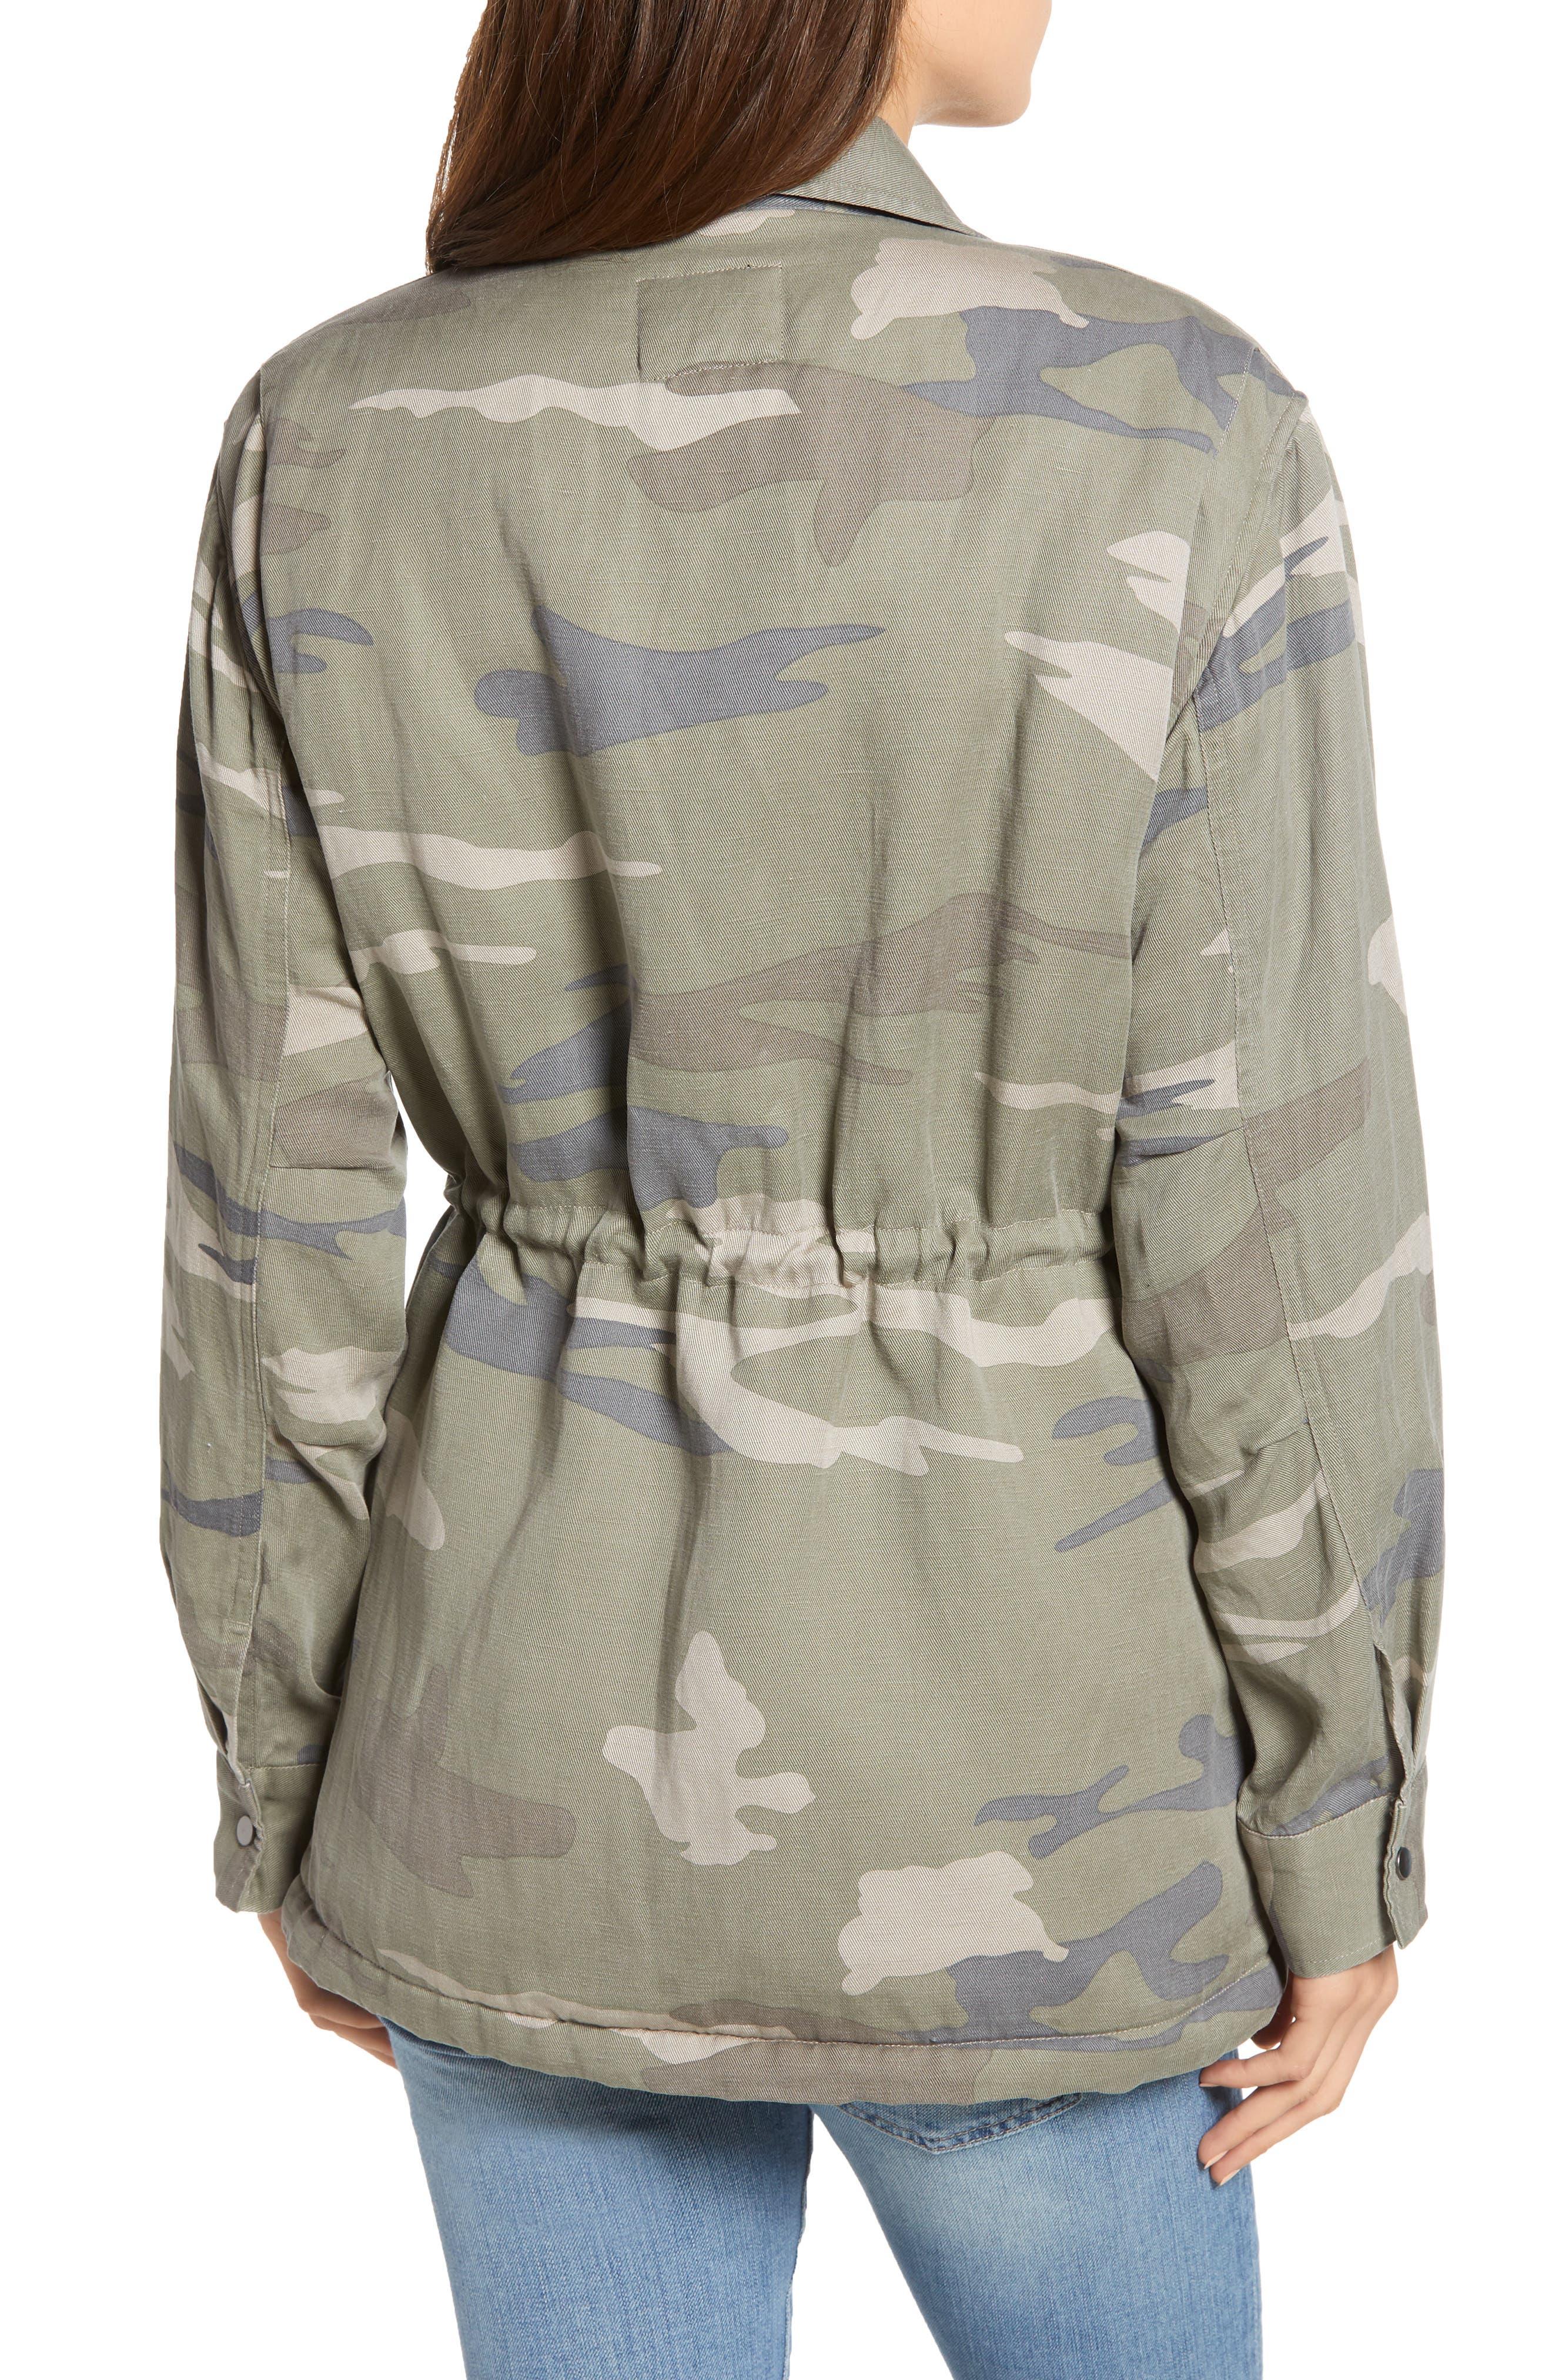 Whitaker Camo Utility Linen Blend Jacket,                             Alternate thumbnail 3, color,                             SAGE CAMO